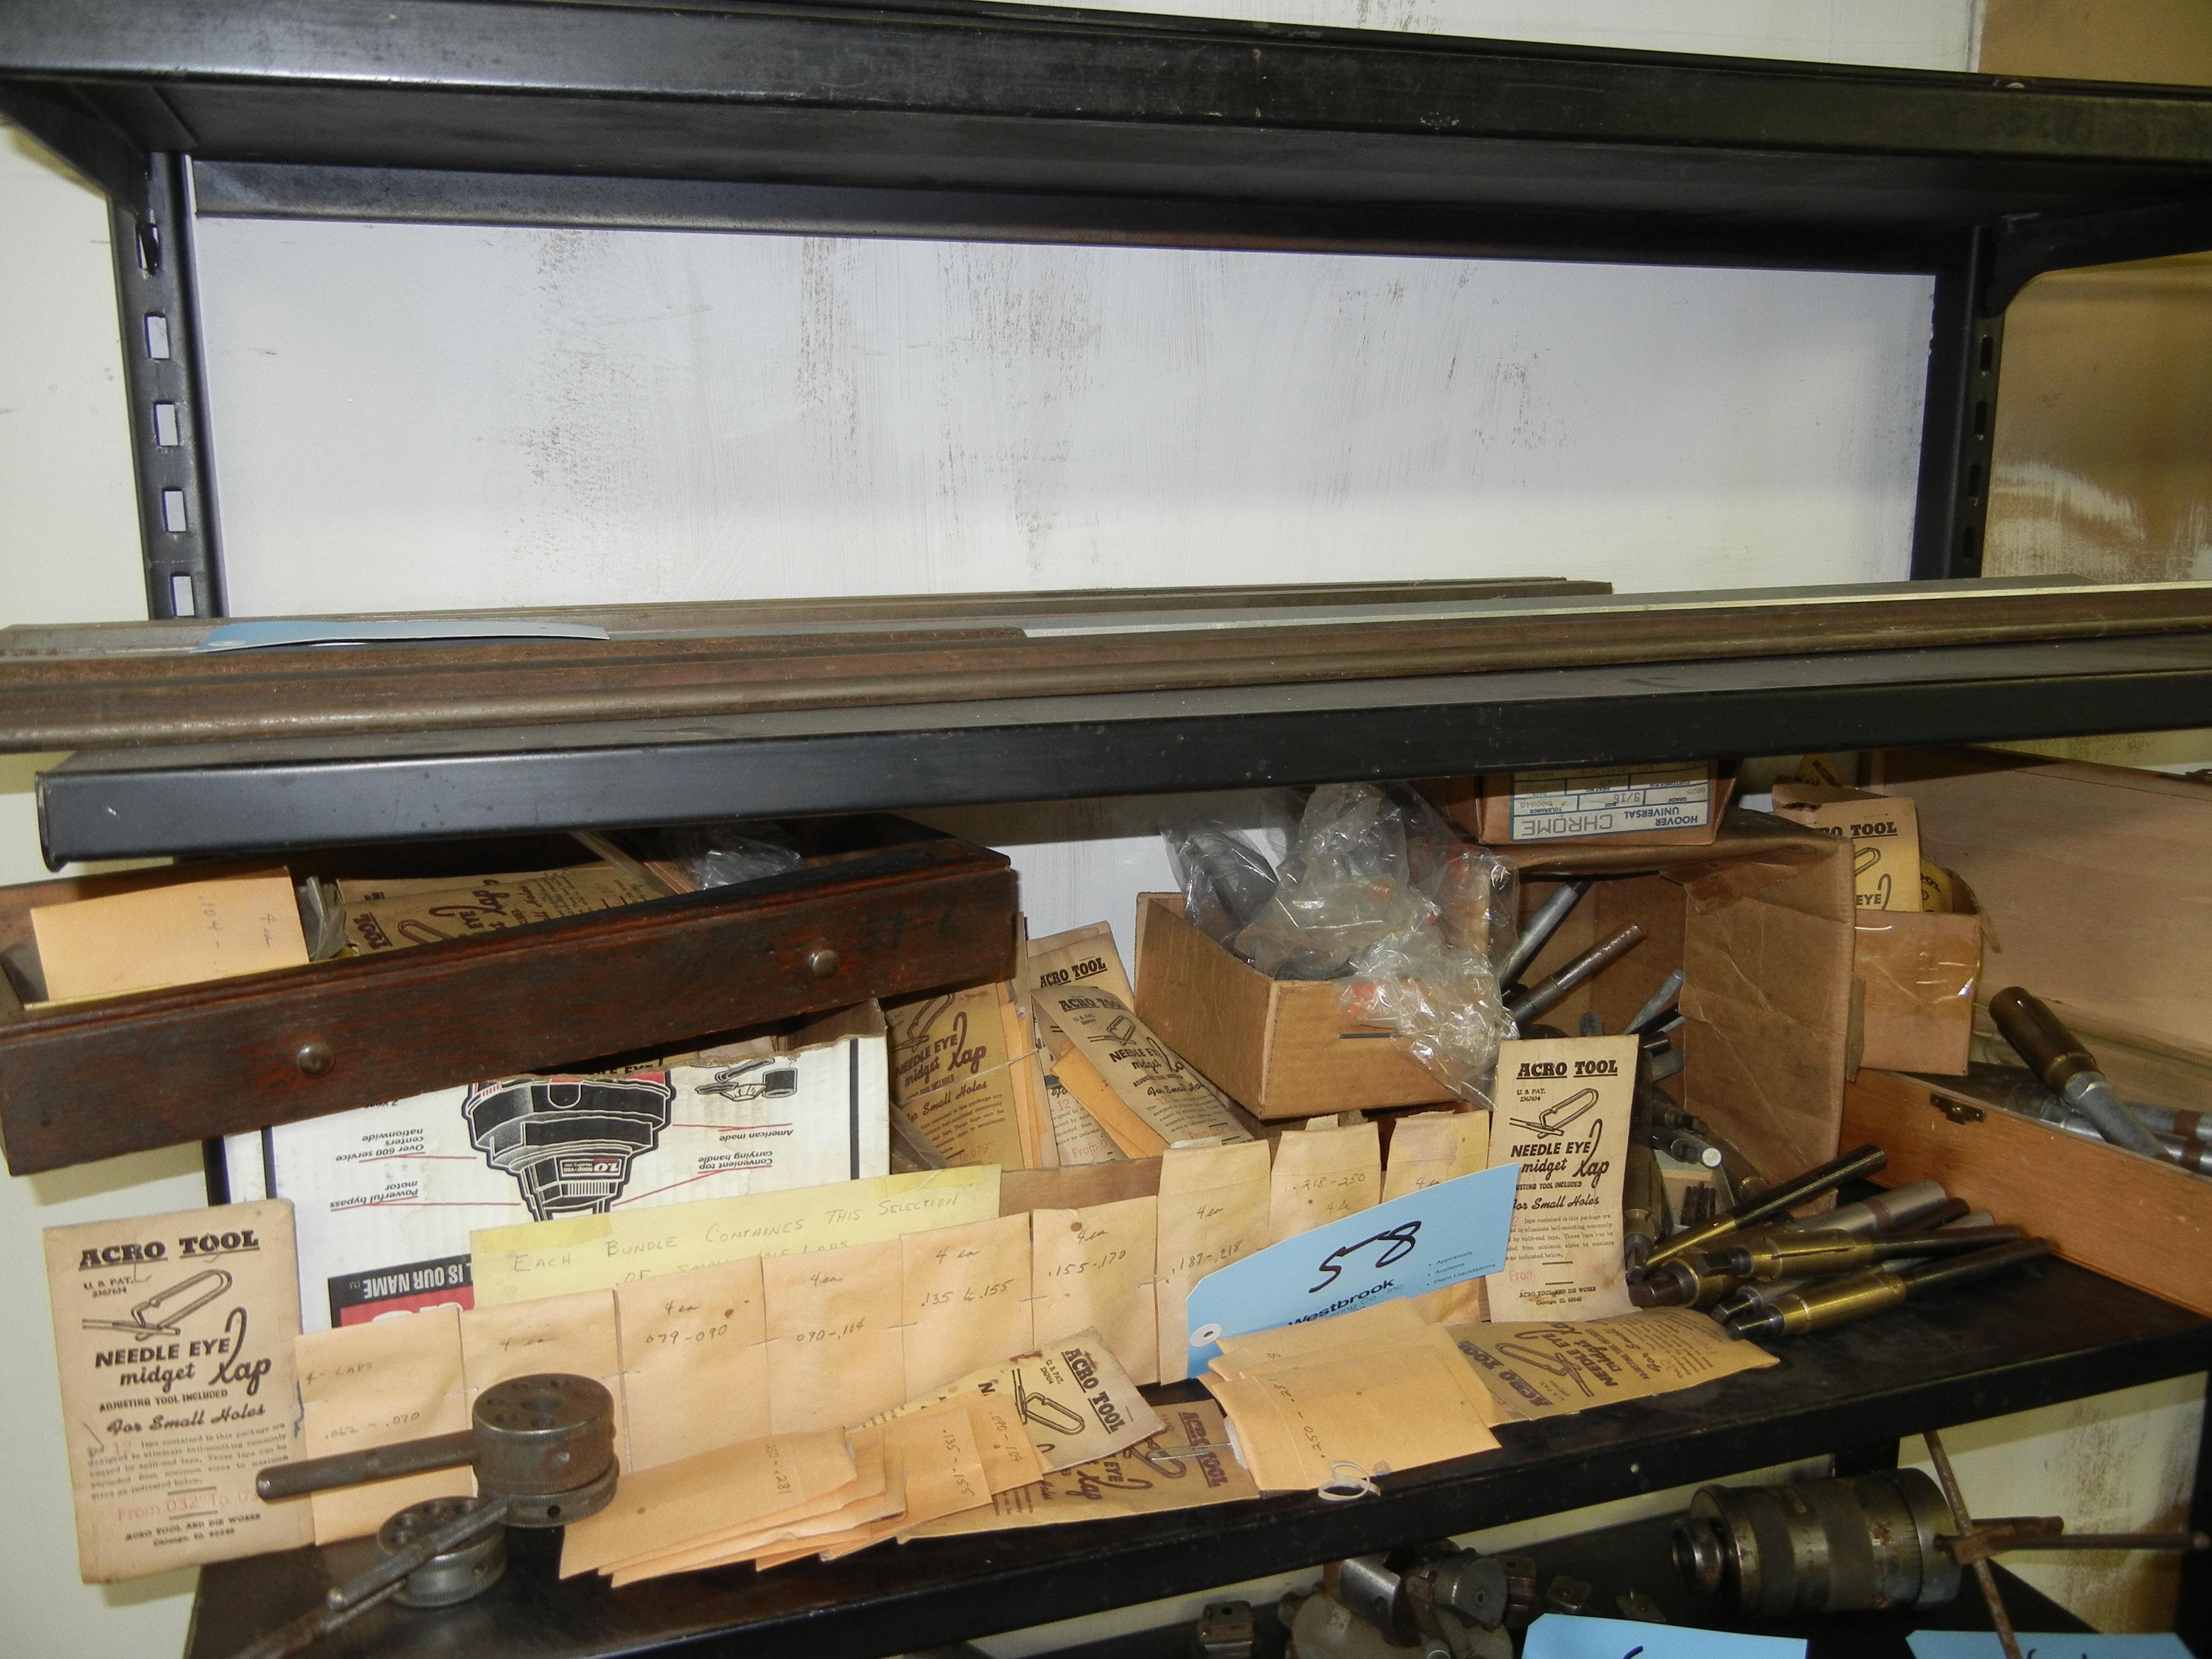 assortment of lap tooling on shelf (shelf not included)